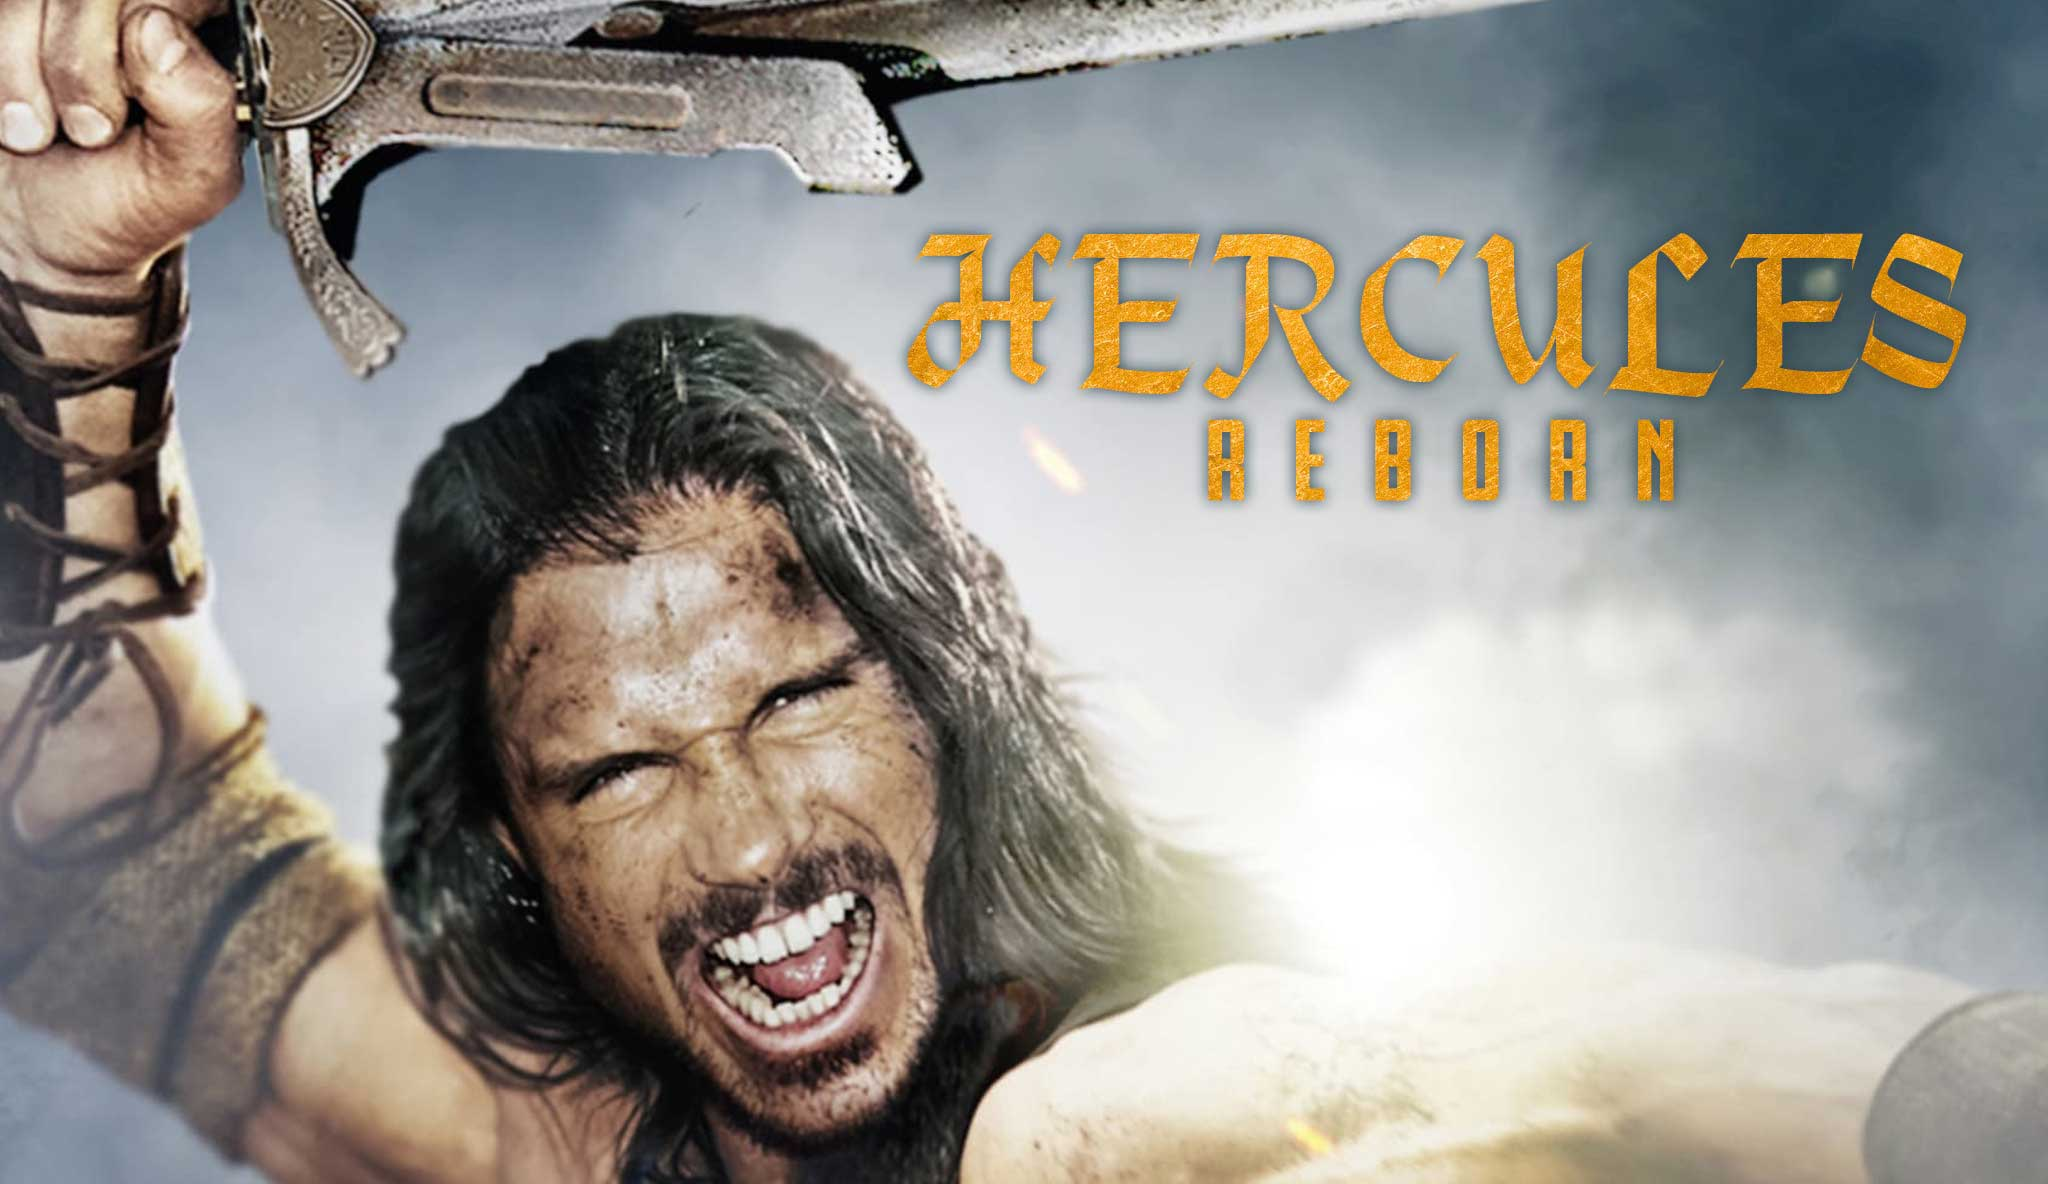 hercules-reborn\header.jpg